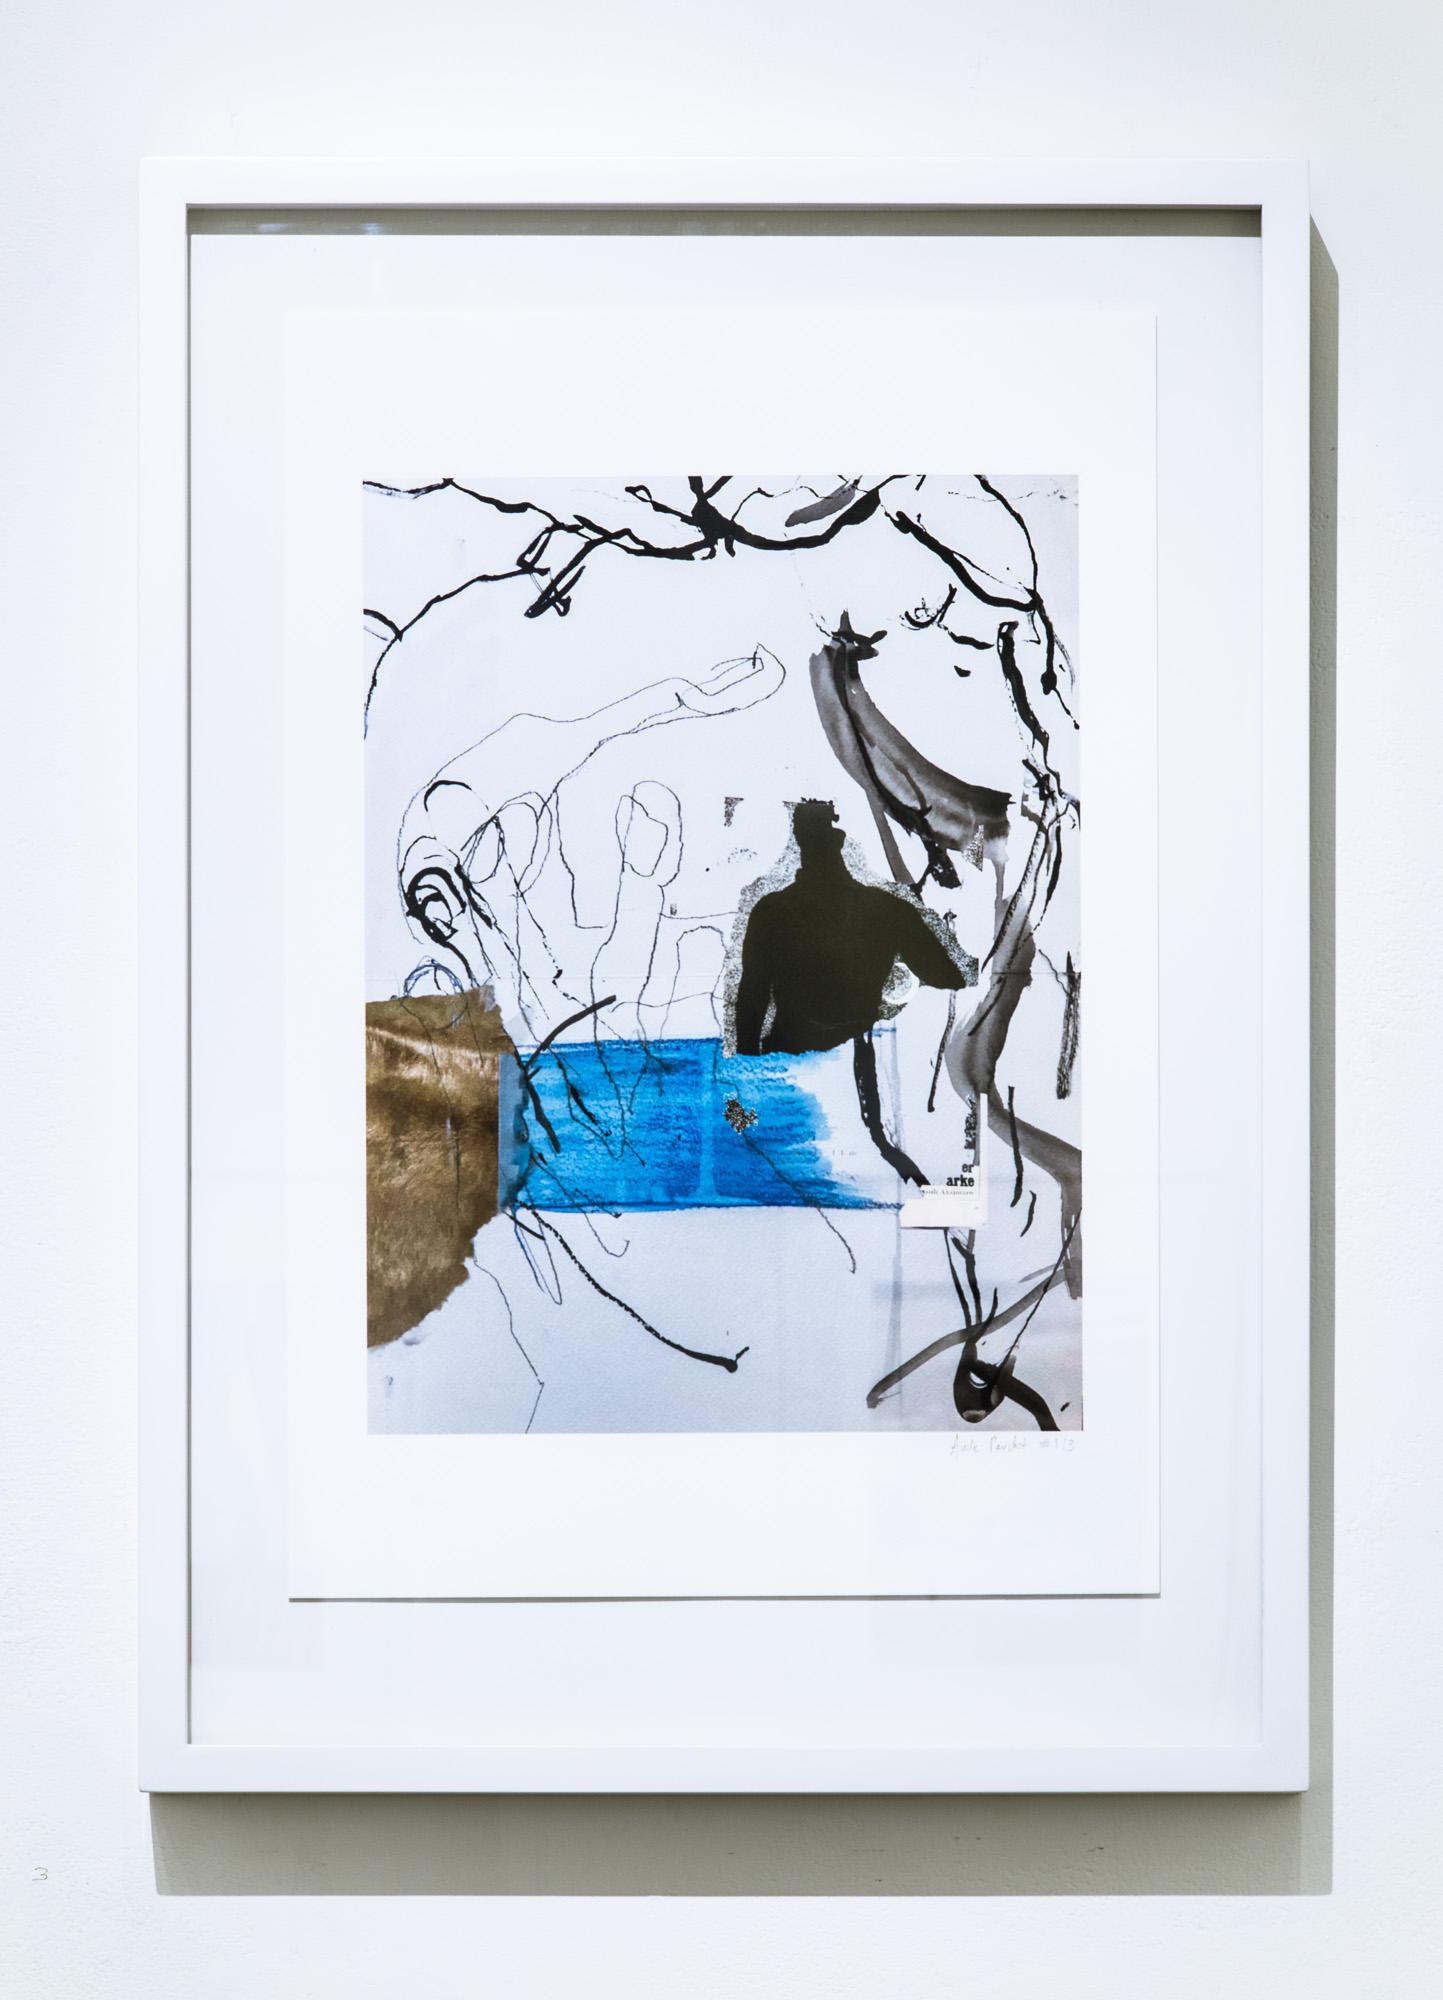 """Digital memory"", Ultra-chrome archival pigments print on aquarelle paper 44cm x 61cm, 2018, Edition of 3 +1AP"